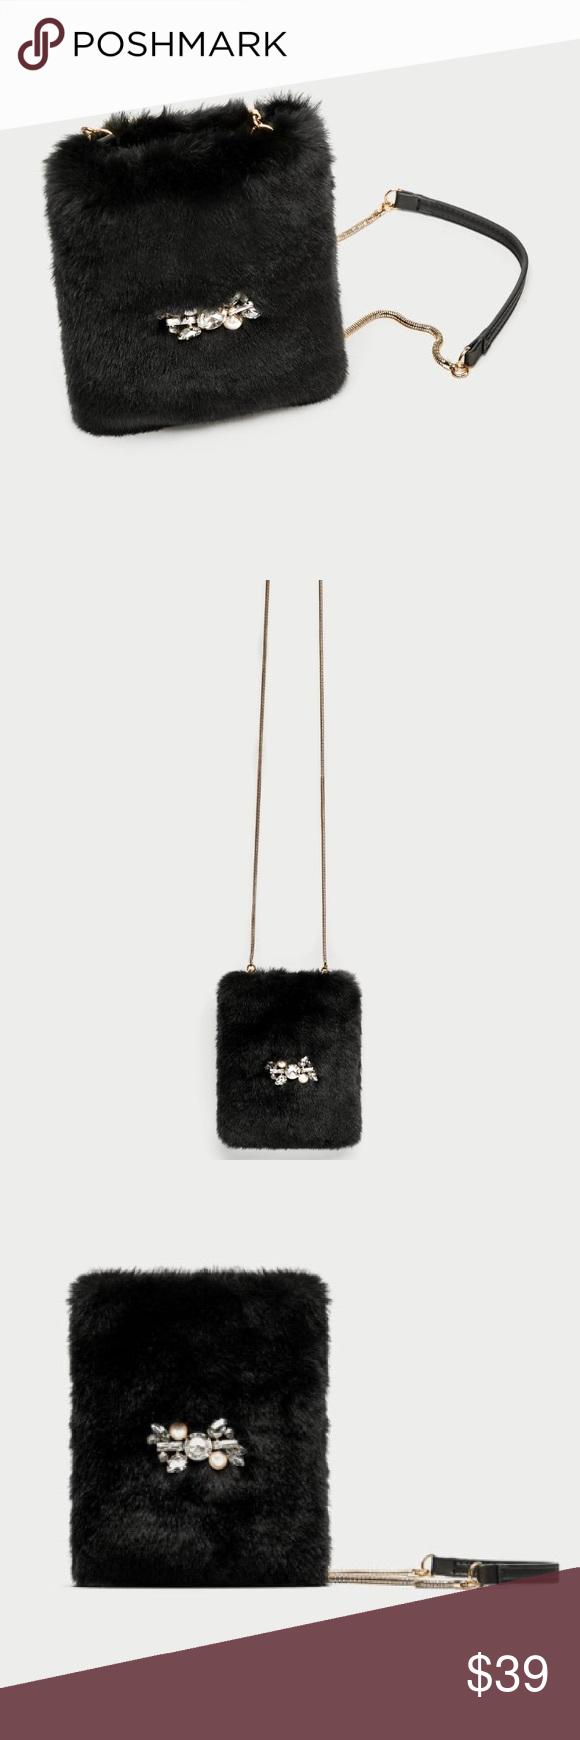 86e8ba0d51bb Mini crossbody with furry detail Black faux fur crossbody bag. Appliqué  Detail on the front